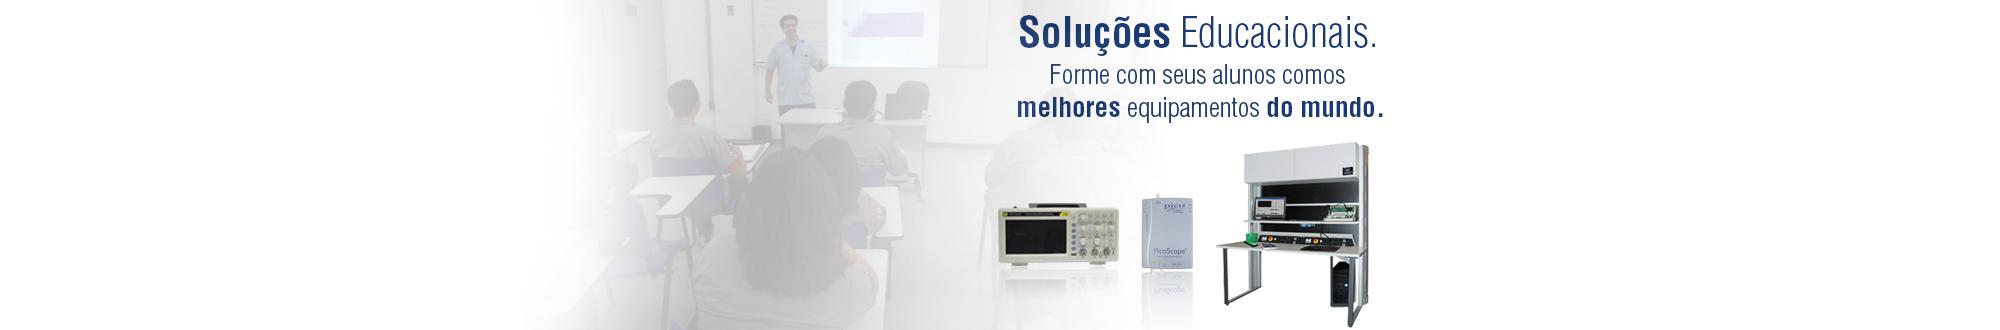 produtos-educacionais-bancada-eletrica-osciloscopio-percon-tecnologia-melhor-preco